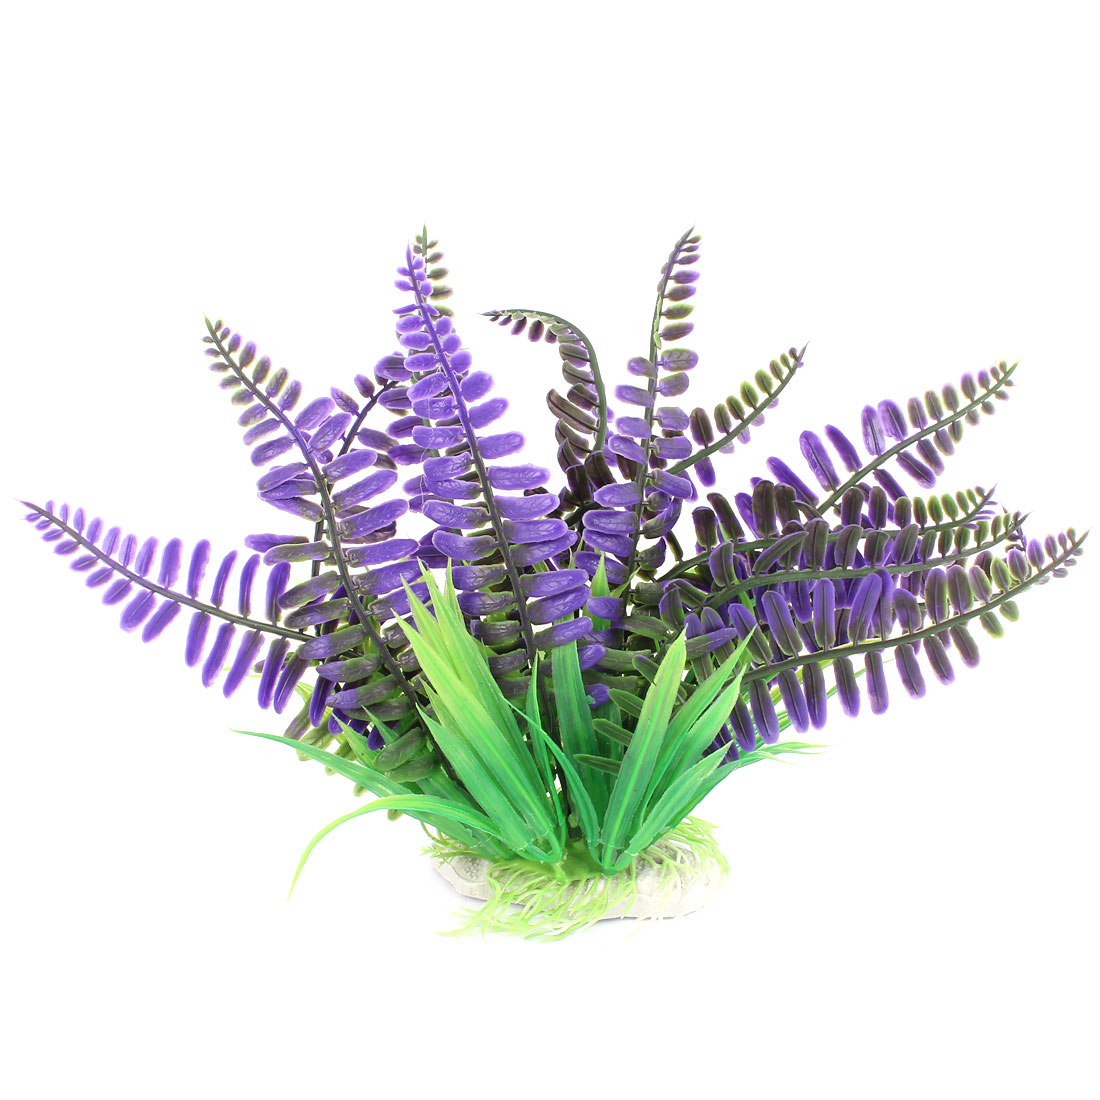 "Fish Tank Aquarium Plastic Ornament Manmade Underwater Plant Grass 8"" Height Purple"